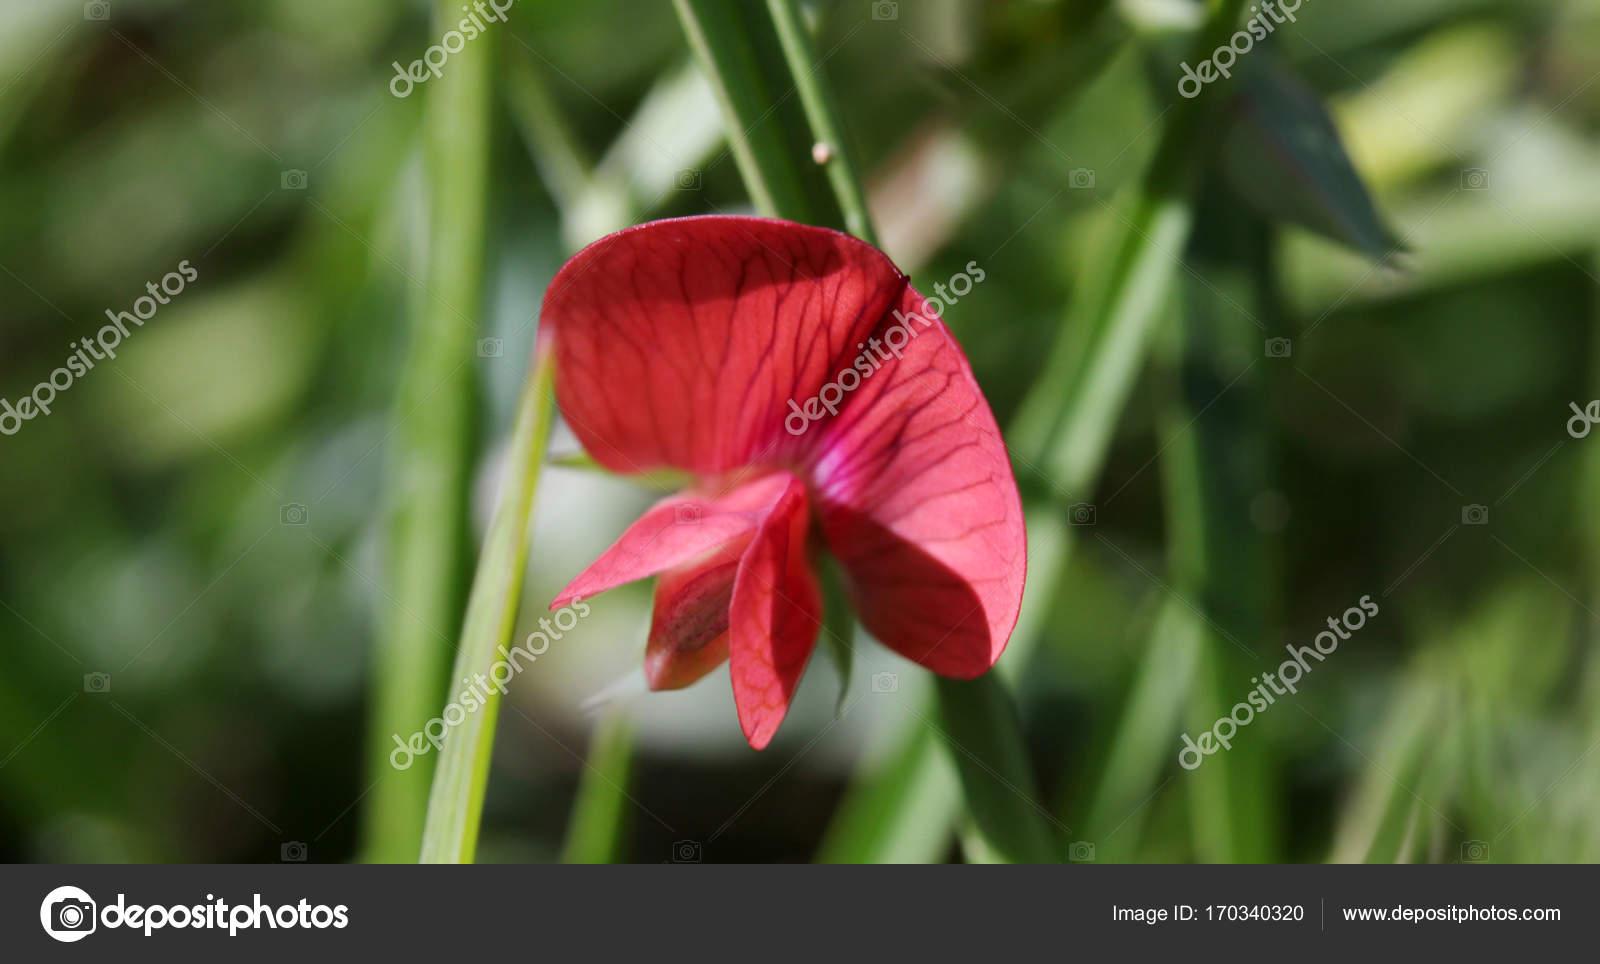 Wild Flowers In Beautiful Nature Stock Photo Reflexsafak 170340320